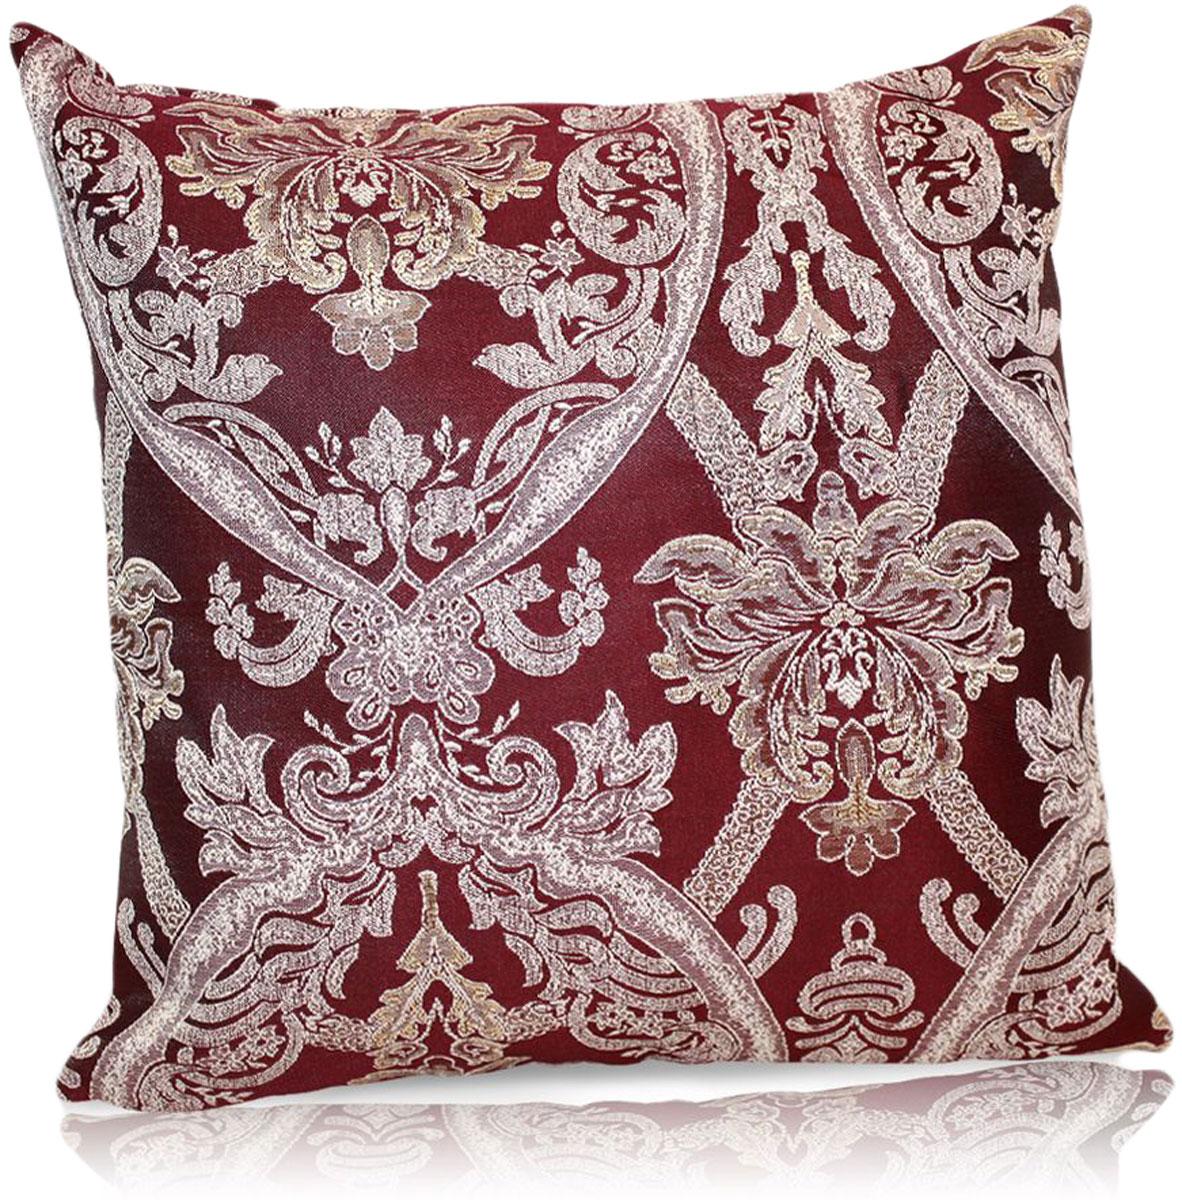 Подушка декоративная KauffOrt Мауритани, цвет: бордовый, 40 x 40 см подушка декоративная kauffort мауритани цвет бежевый 40 x 40 см